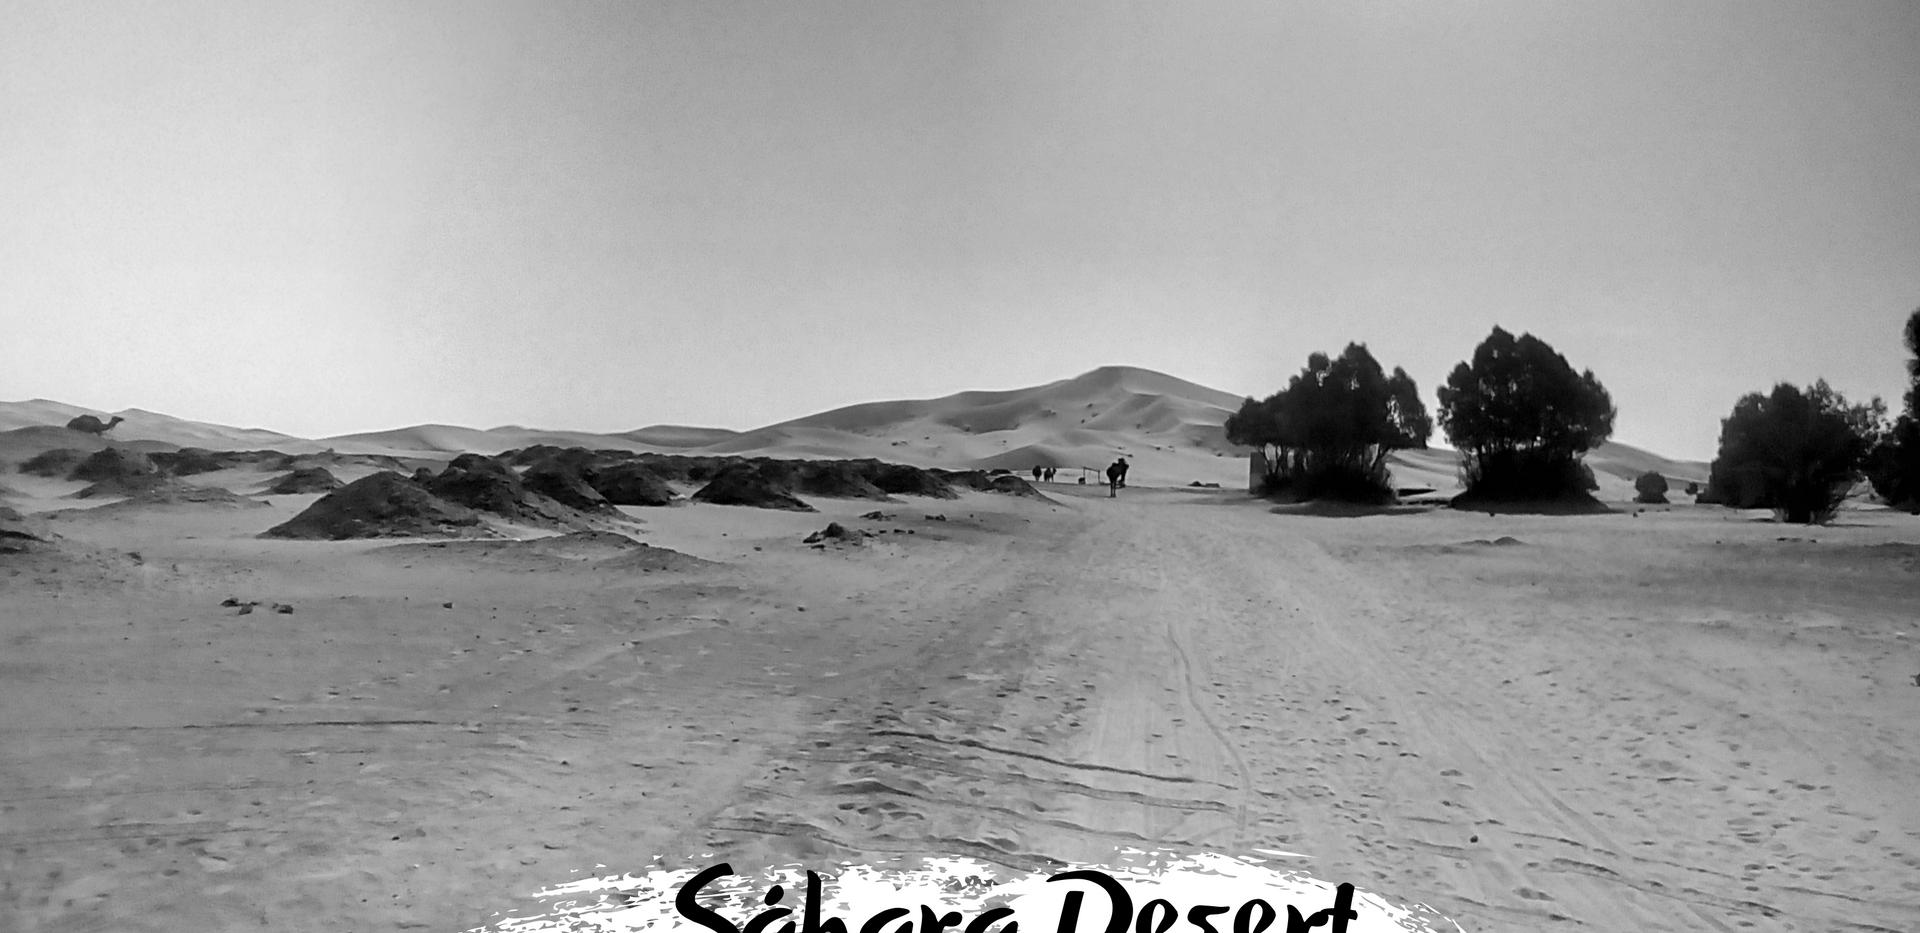 Sáhara Desert Negra.png